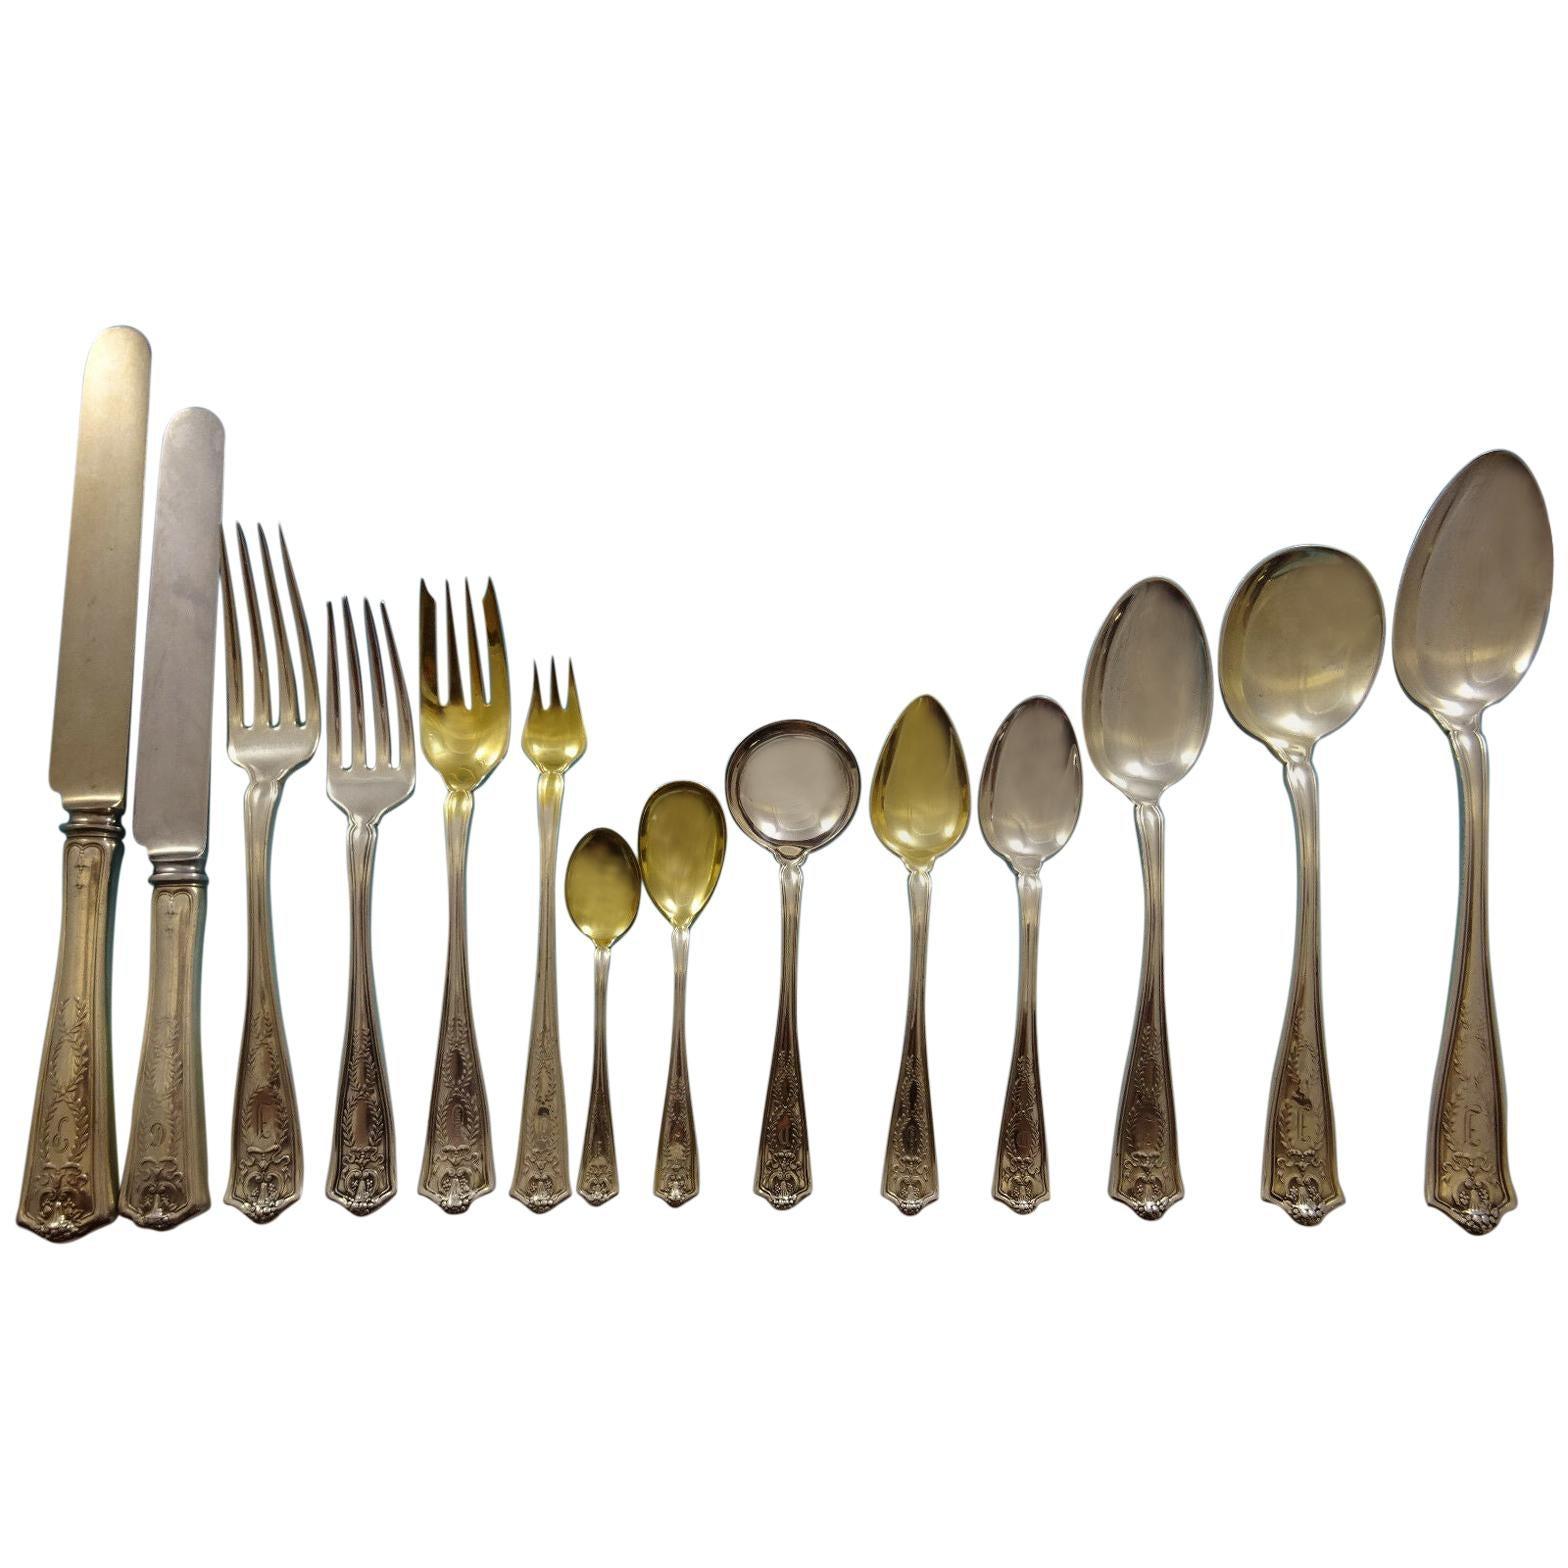 Winthrop by Tiffany & Co Sterling Silver Flatware Set 8 Service 112 Pcs Dinner